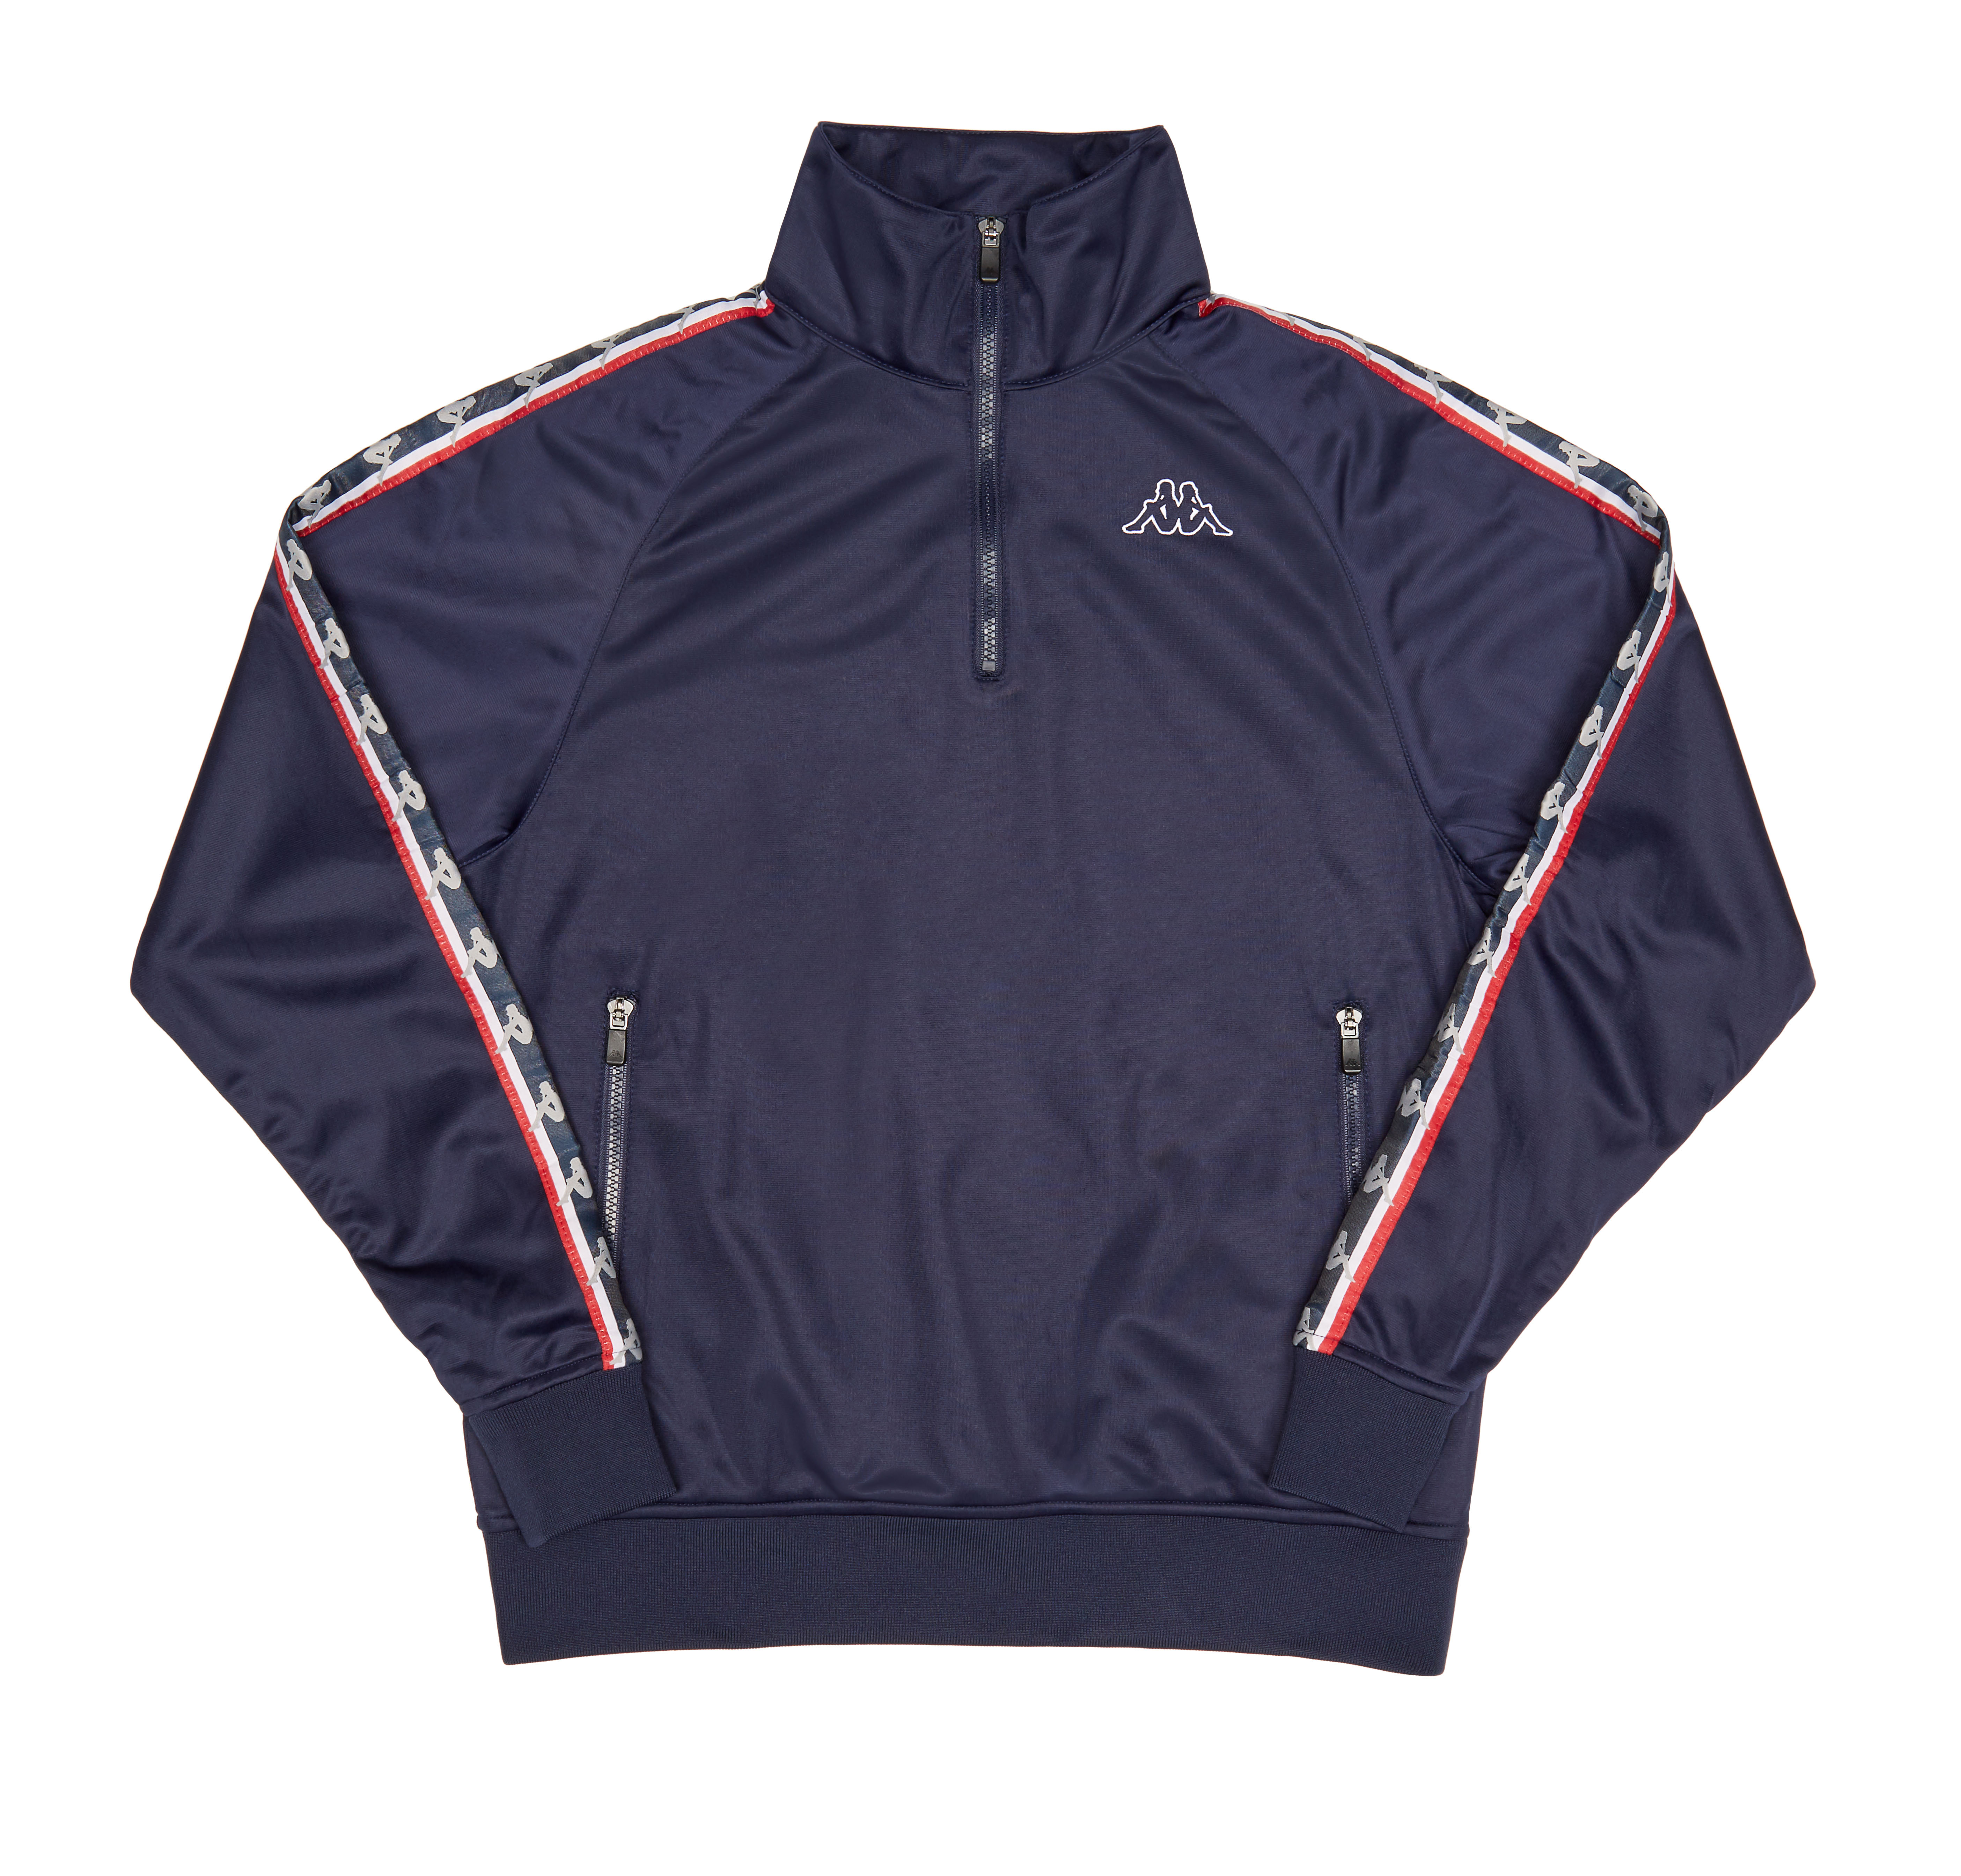 SSENSE_Kappa_SSENSE Exclusive Navy Track Jacket